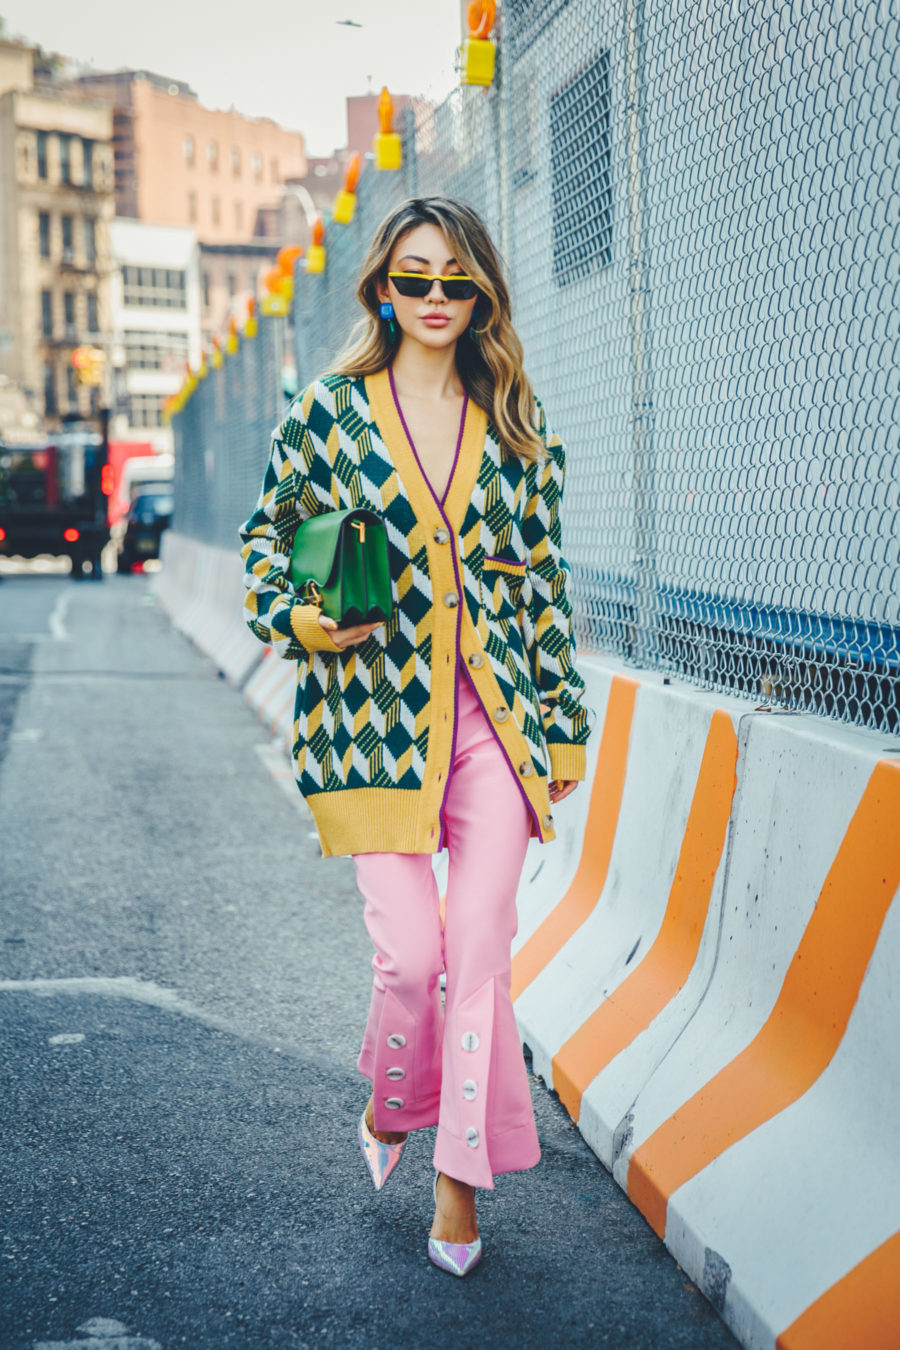 NYFW SS19 Recap, NYFW SS19 Street Style, oversized cardigan trend, argyle cardigan // Notjessfashion.com